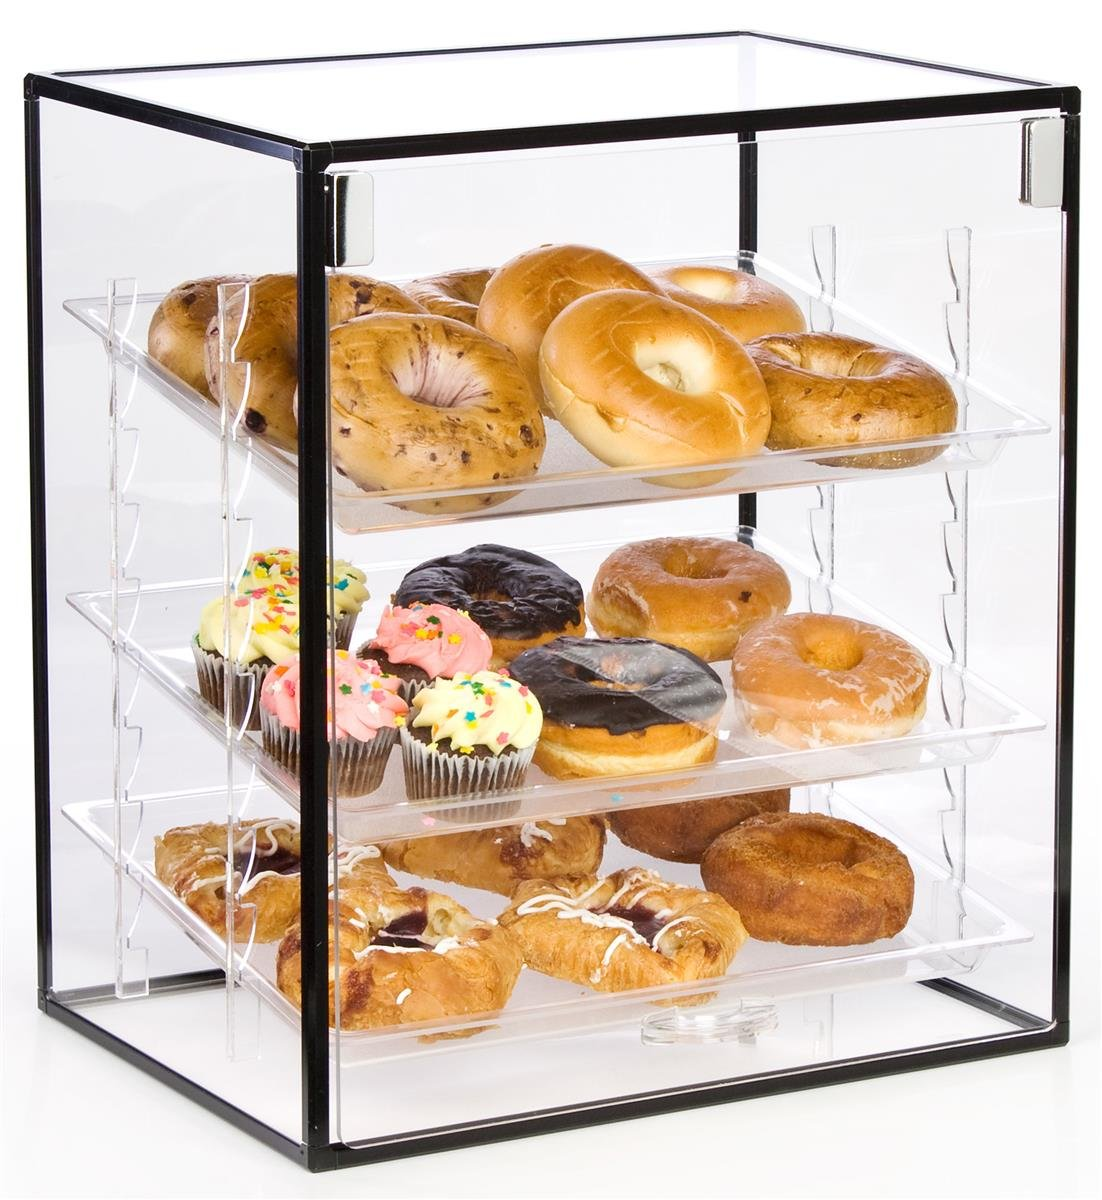 Amazon.com: Clear Acrylic Countertop Bakery Display Case, 15-5/8 ...